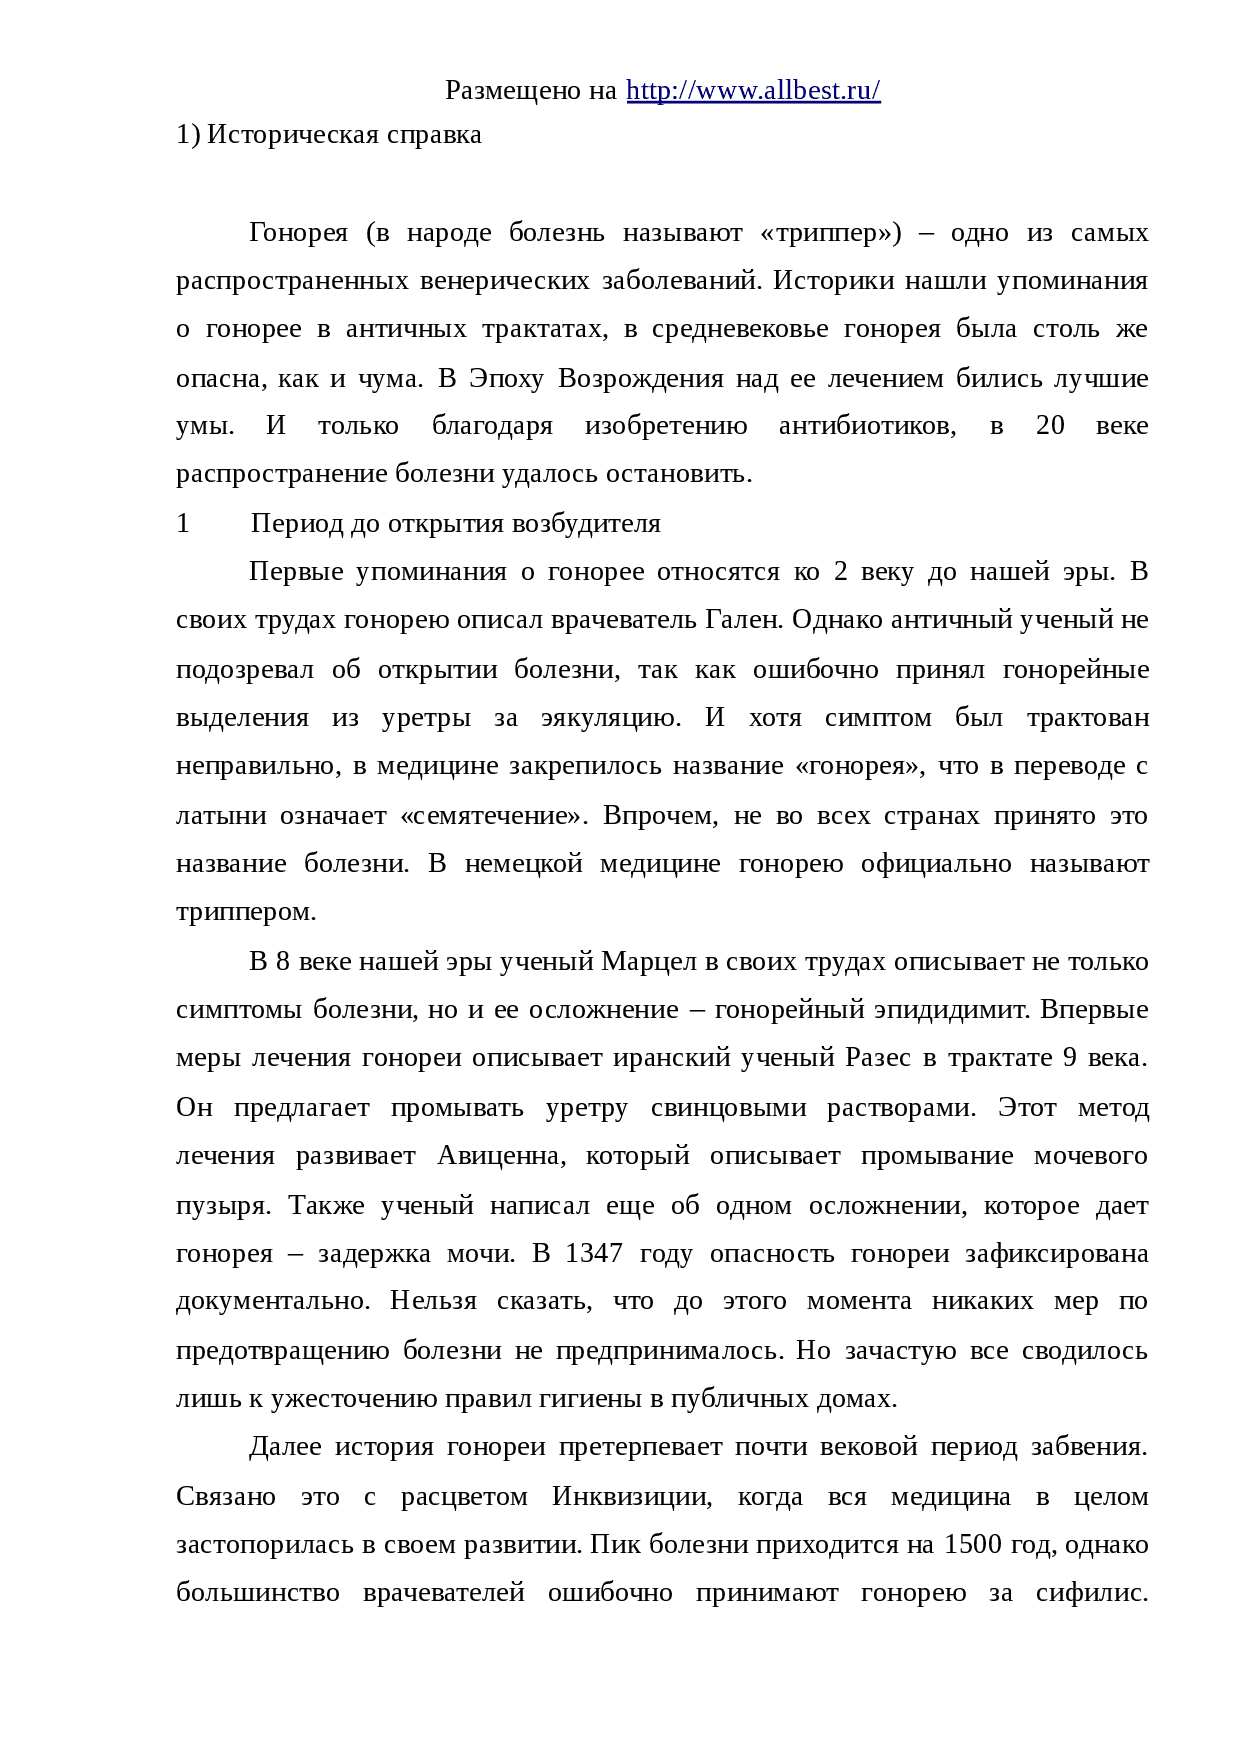 Цефтриаксон при хламидиозе схема лечения